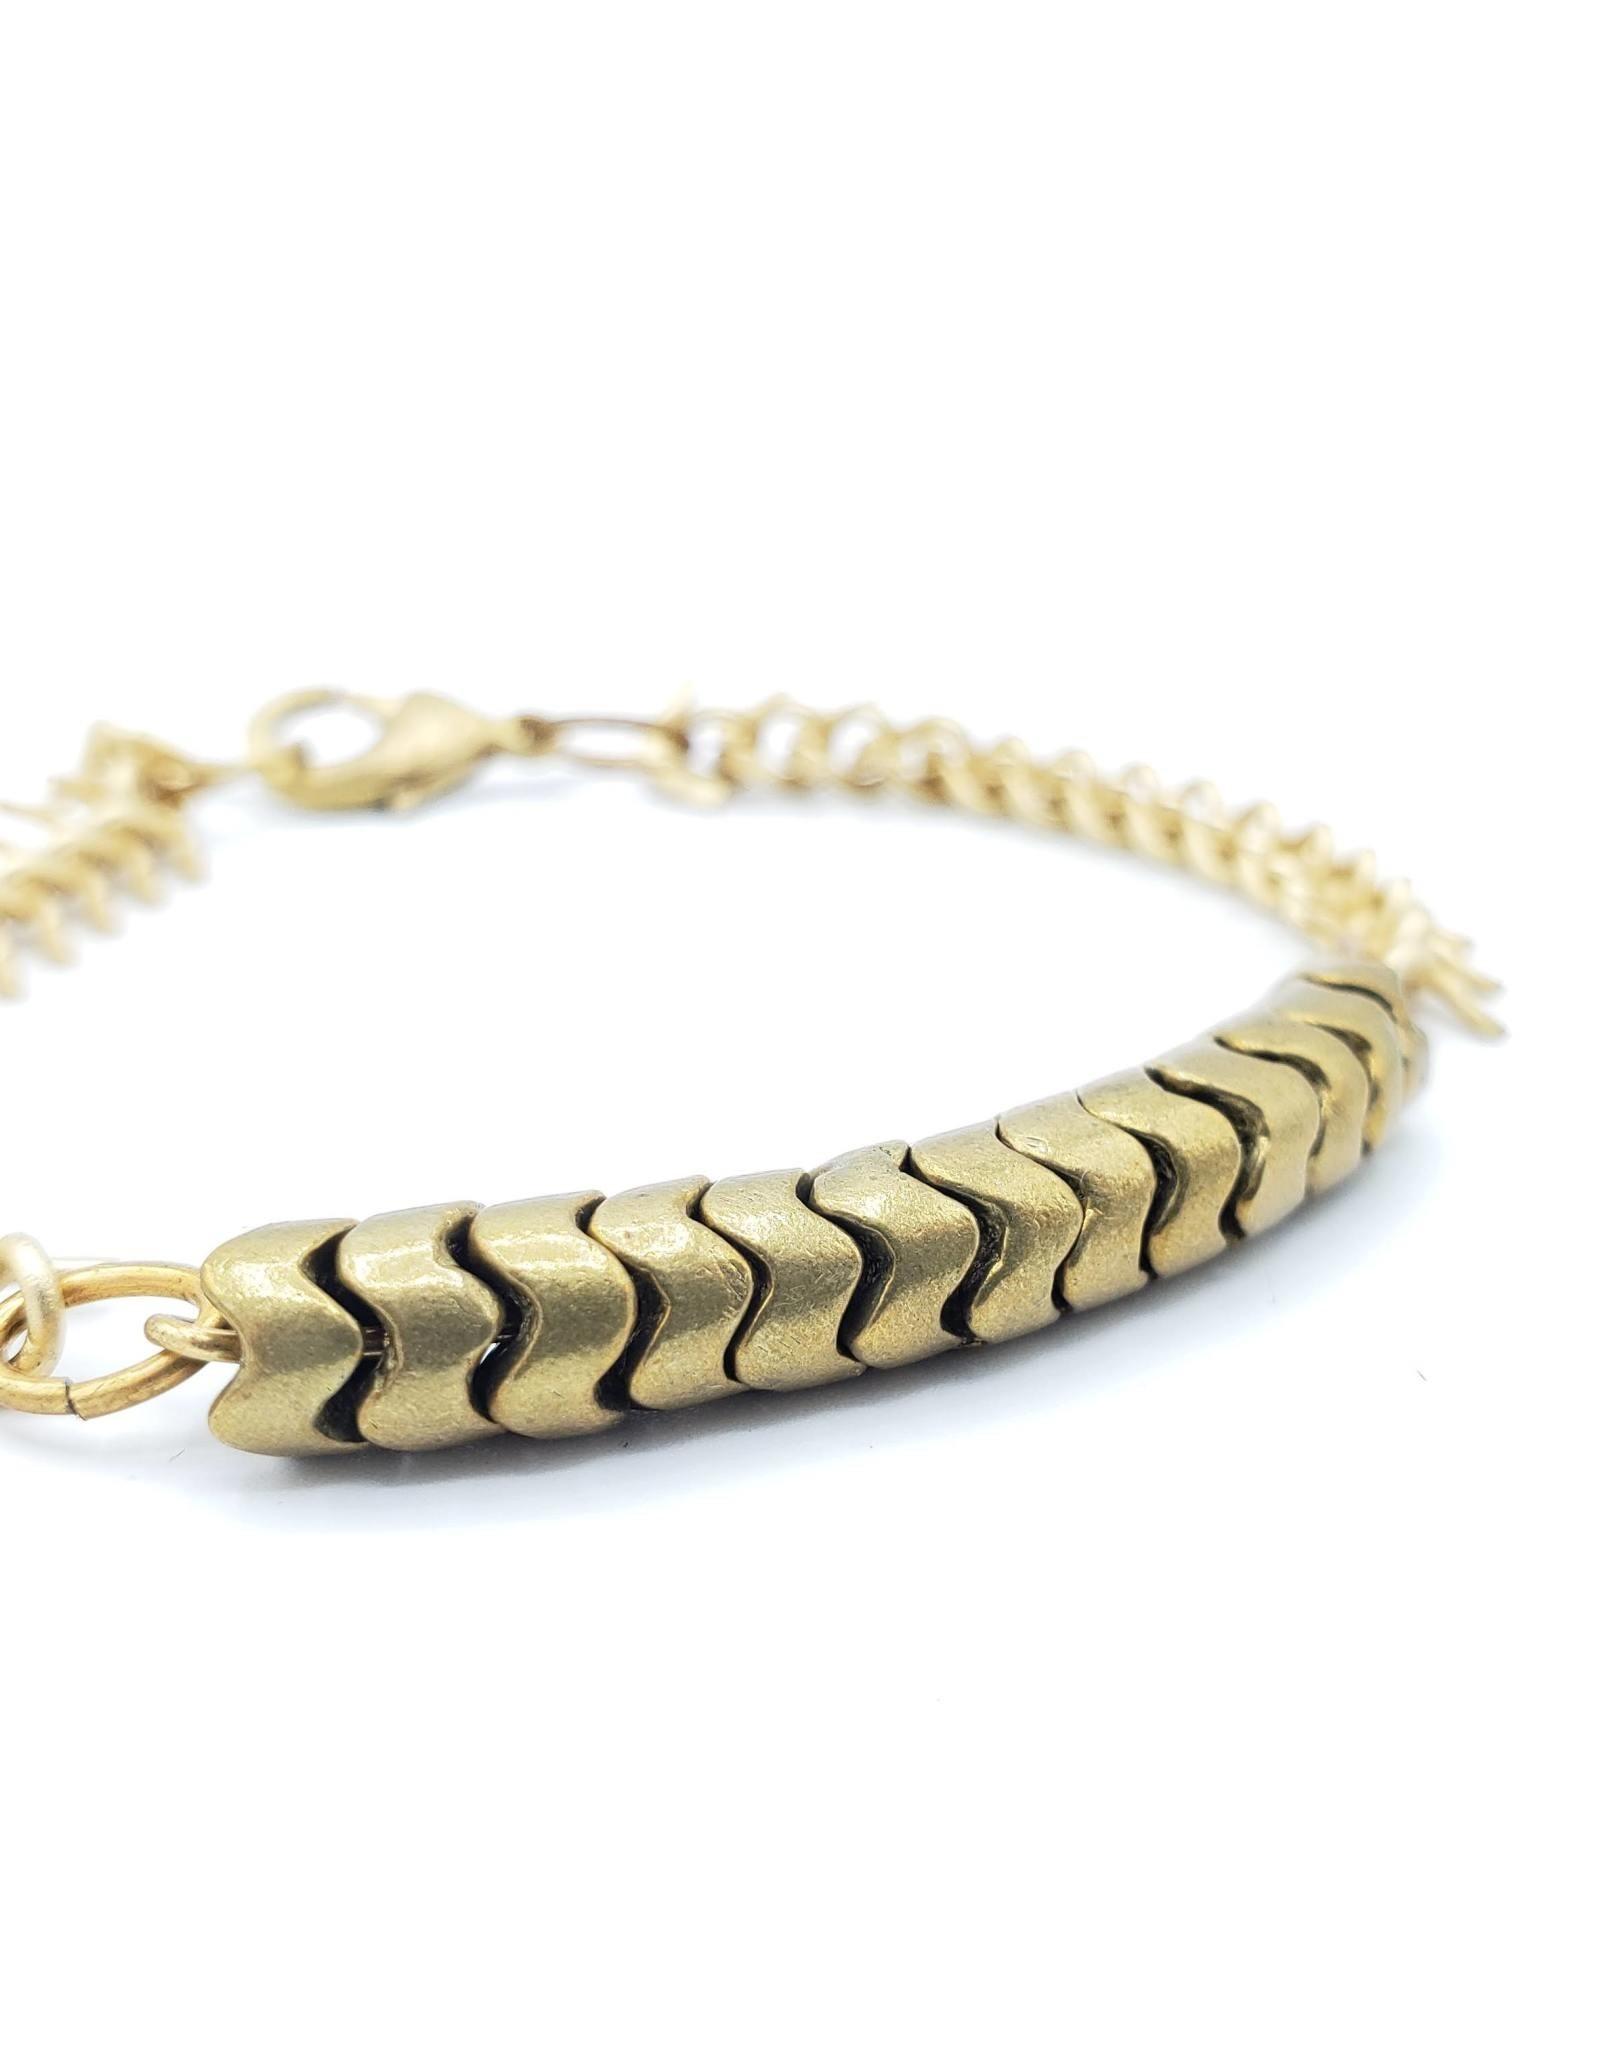 Brass African bead and fishbone bracelet